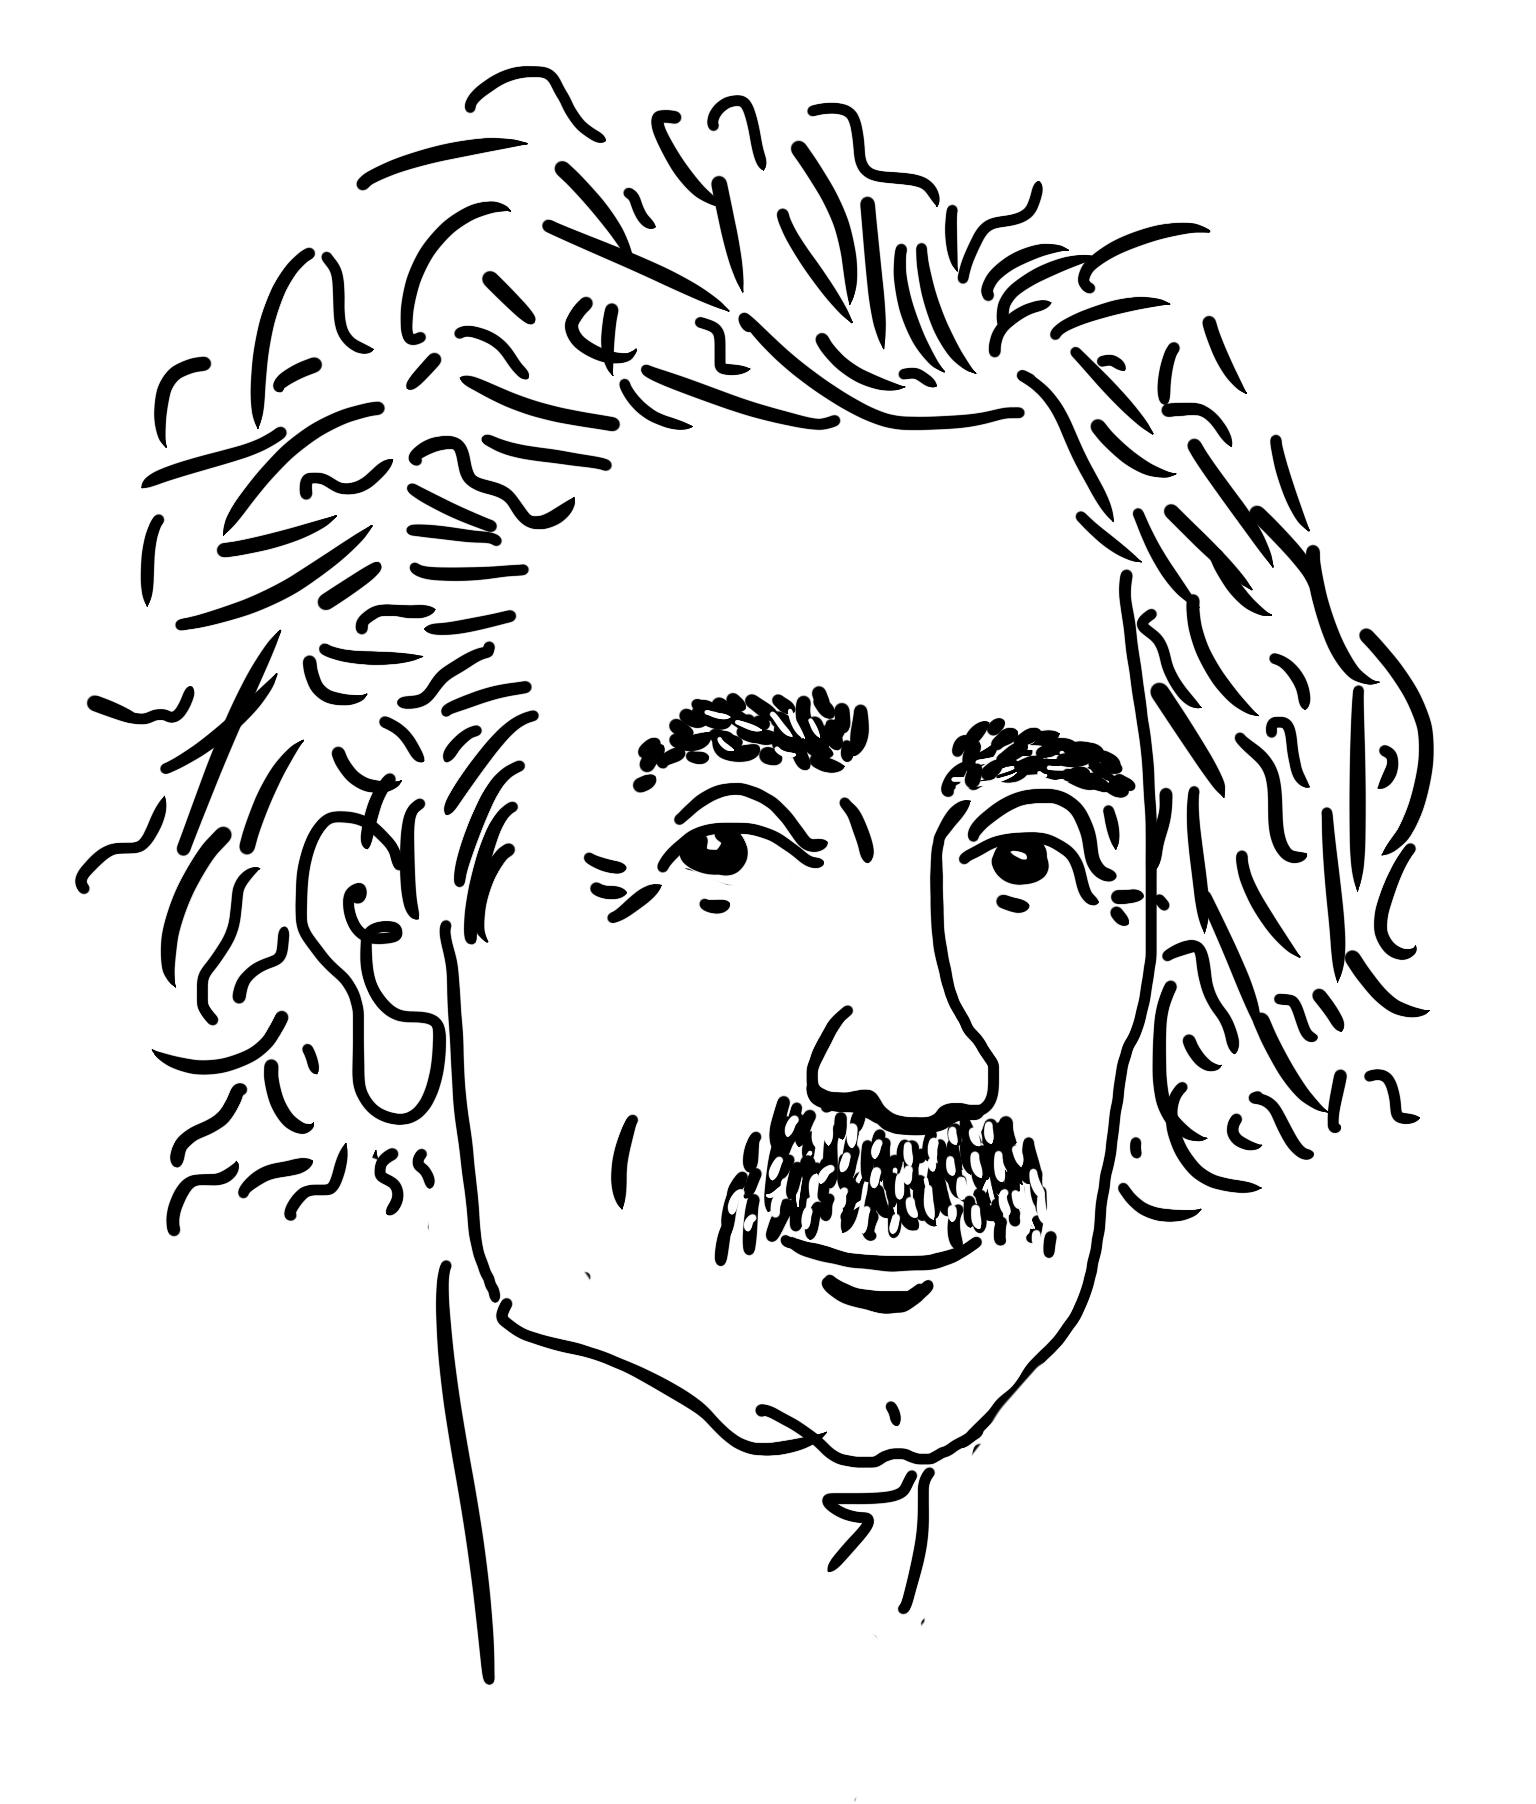 эйнштейн нарисован гдз